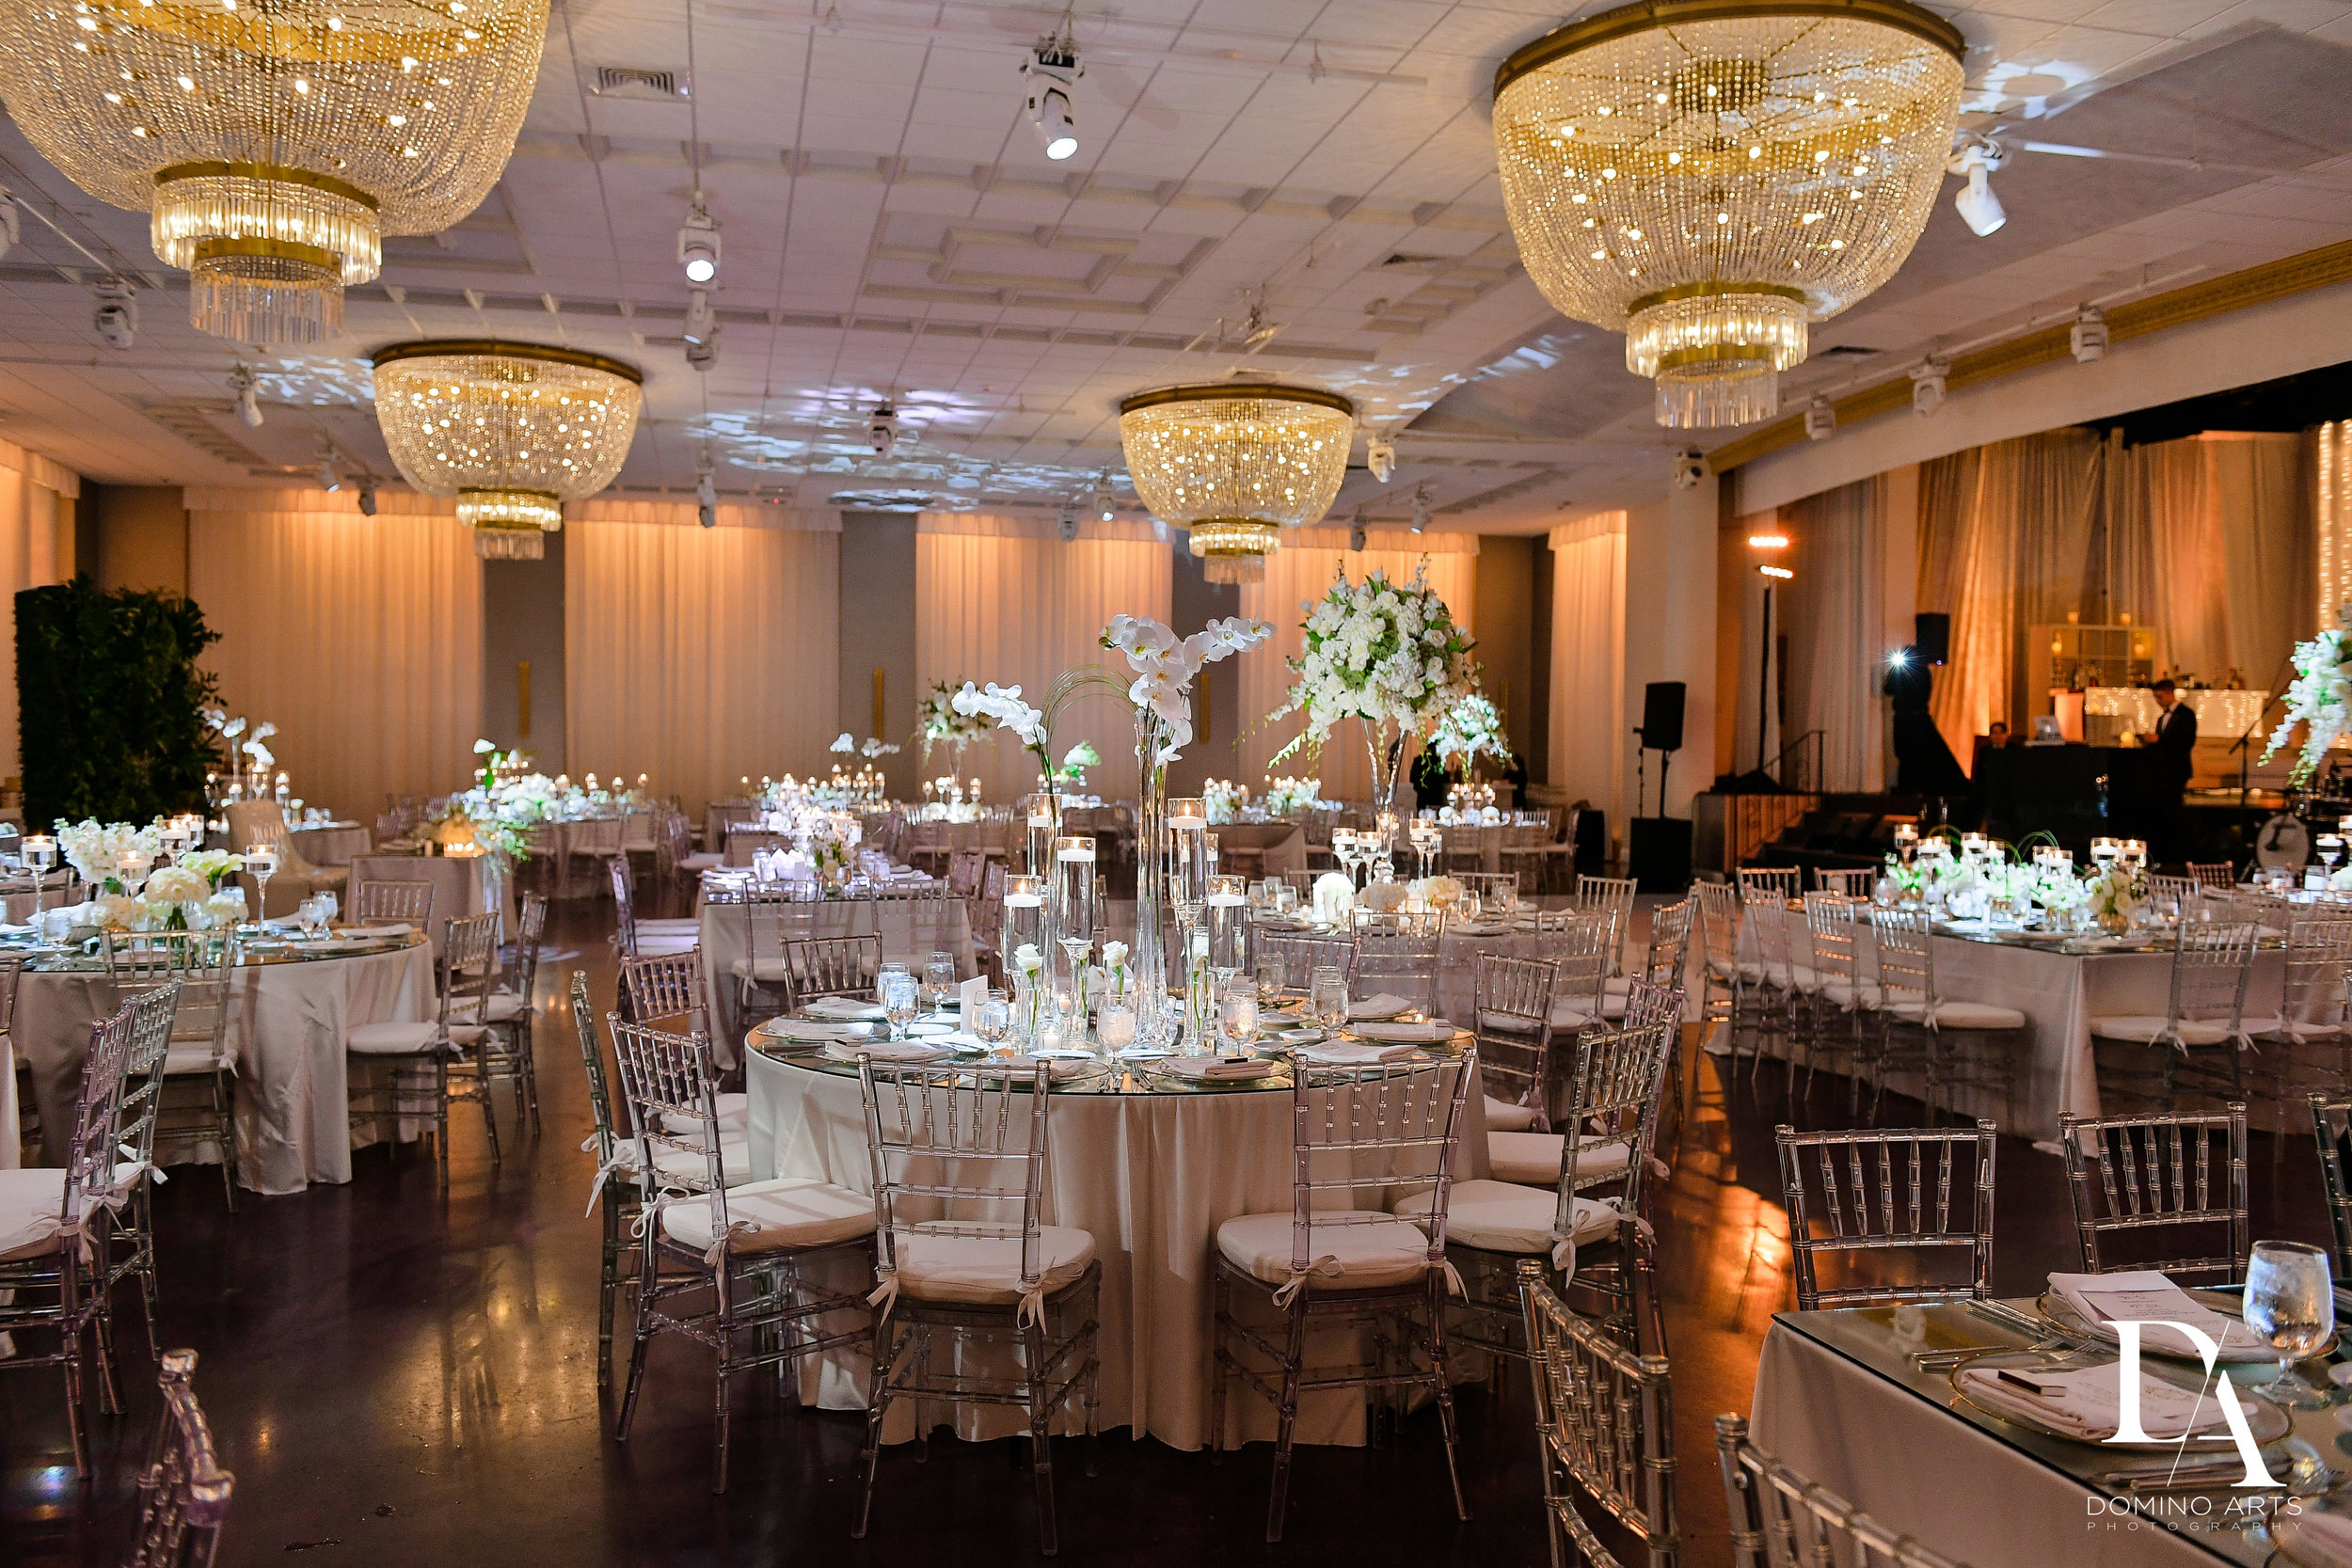 Beautiful Wedding Venue Miami Beach .jpg